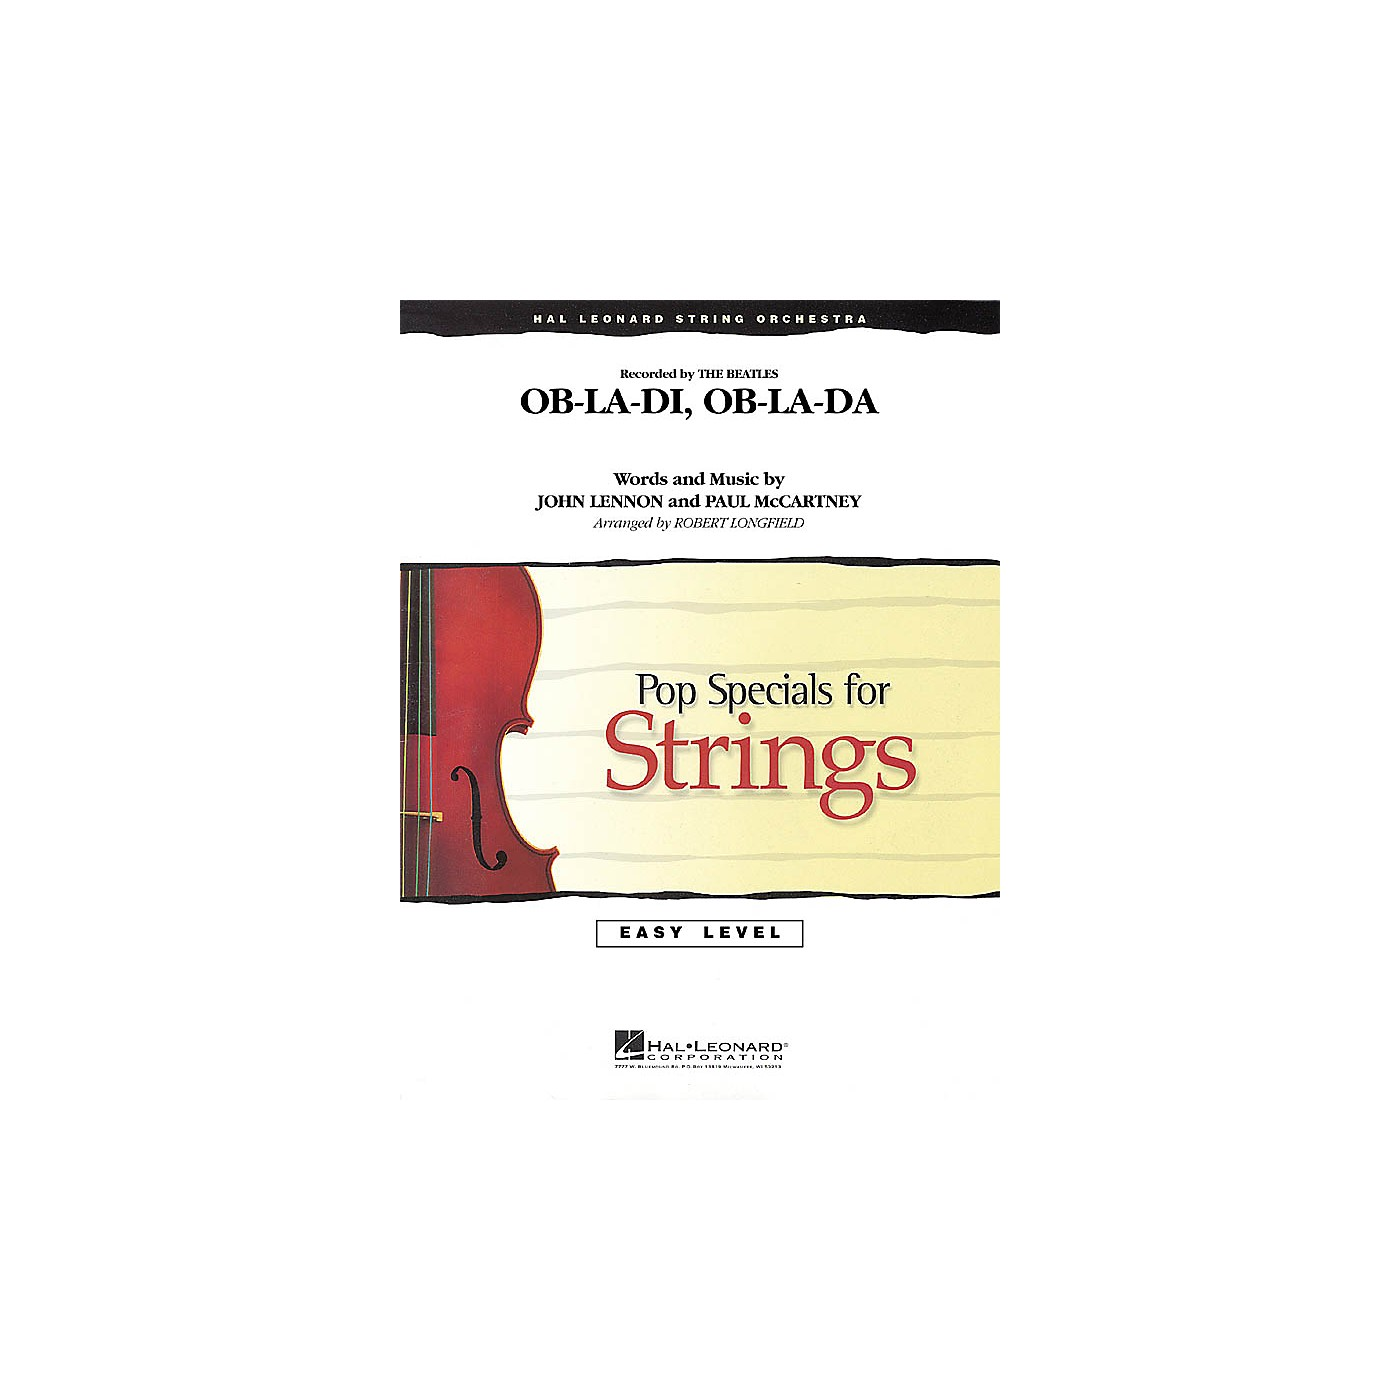 Hal Leonard Ob-La-Di, Ob-La-Da Easy Pop Specials For Strings Series Arranged by Robert Longfield thumbnail